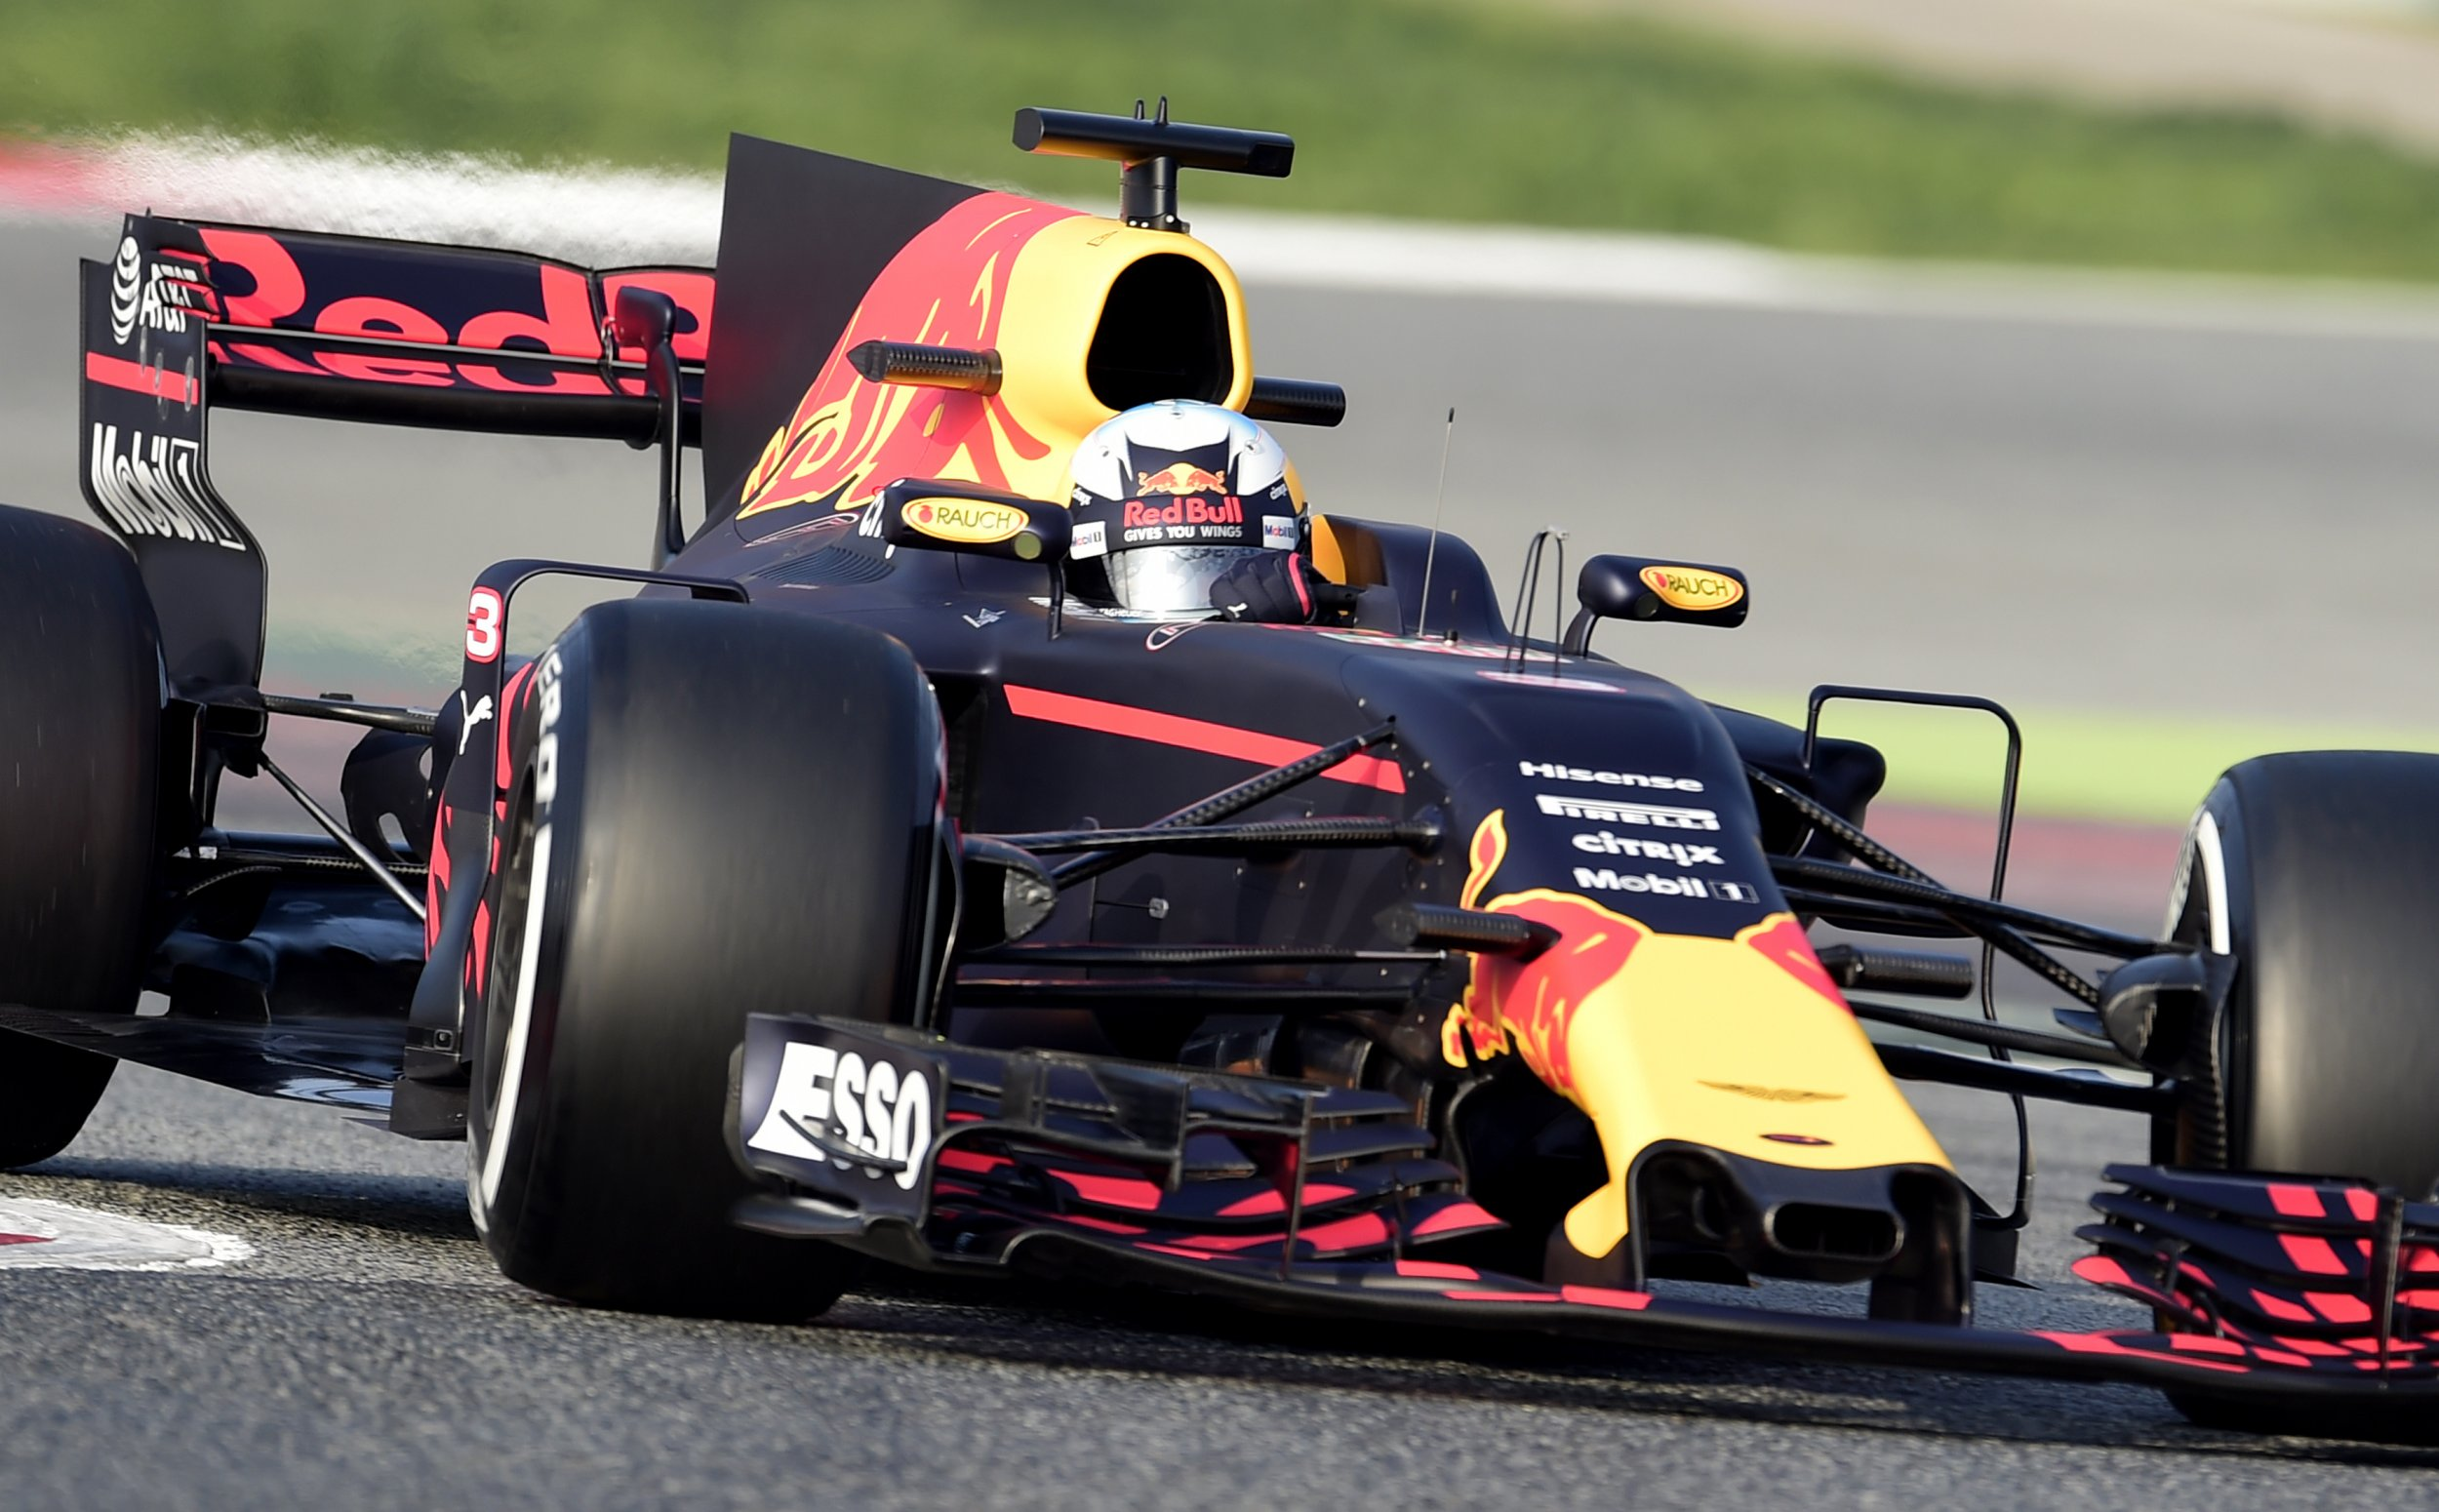 Red Bull Racing's Australian driver Daniel Ricciardo at the Circuit de Catalunya, Barcelona, February 27